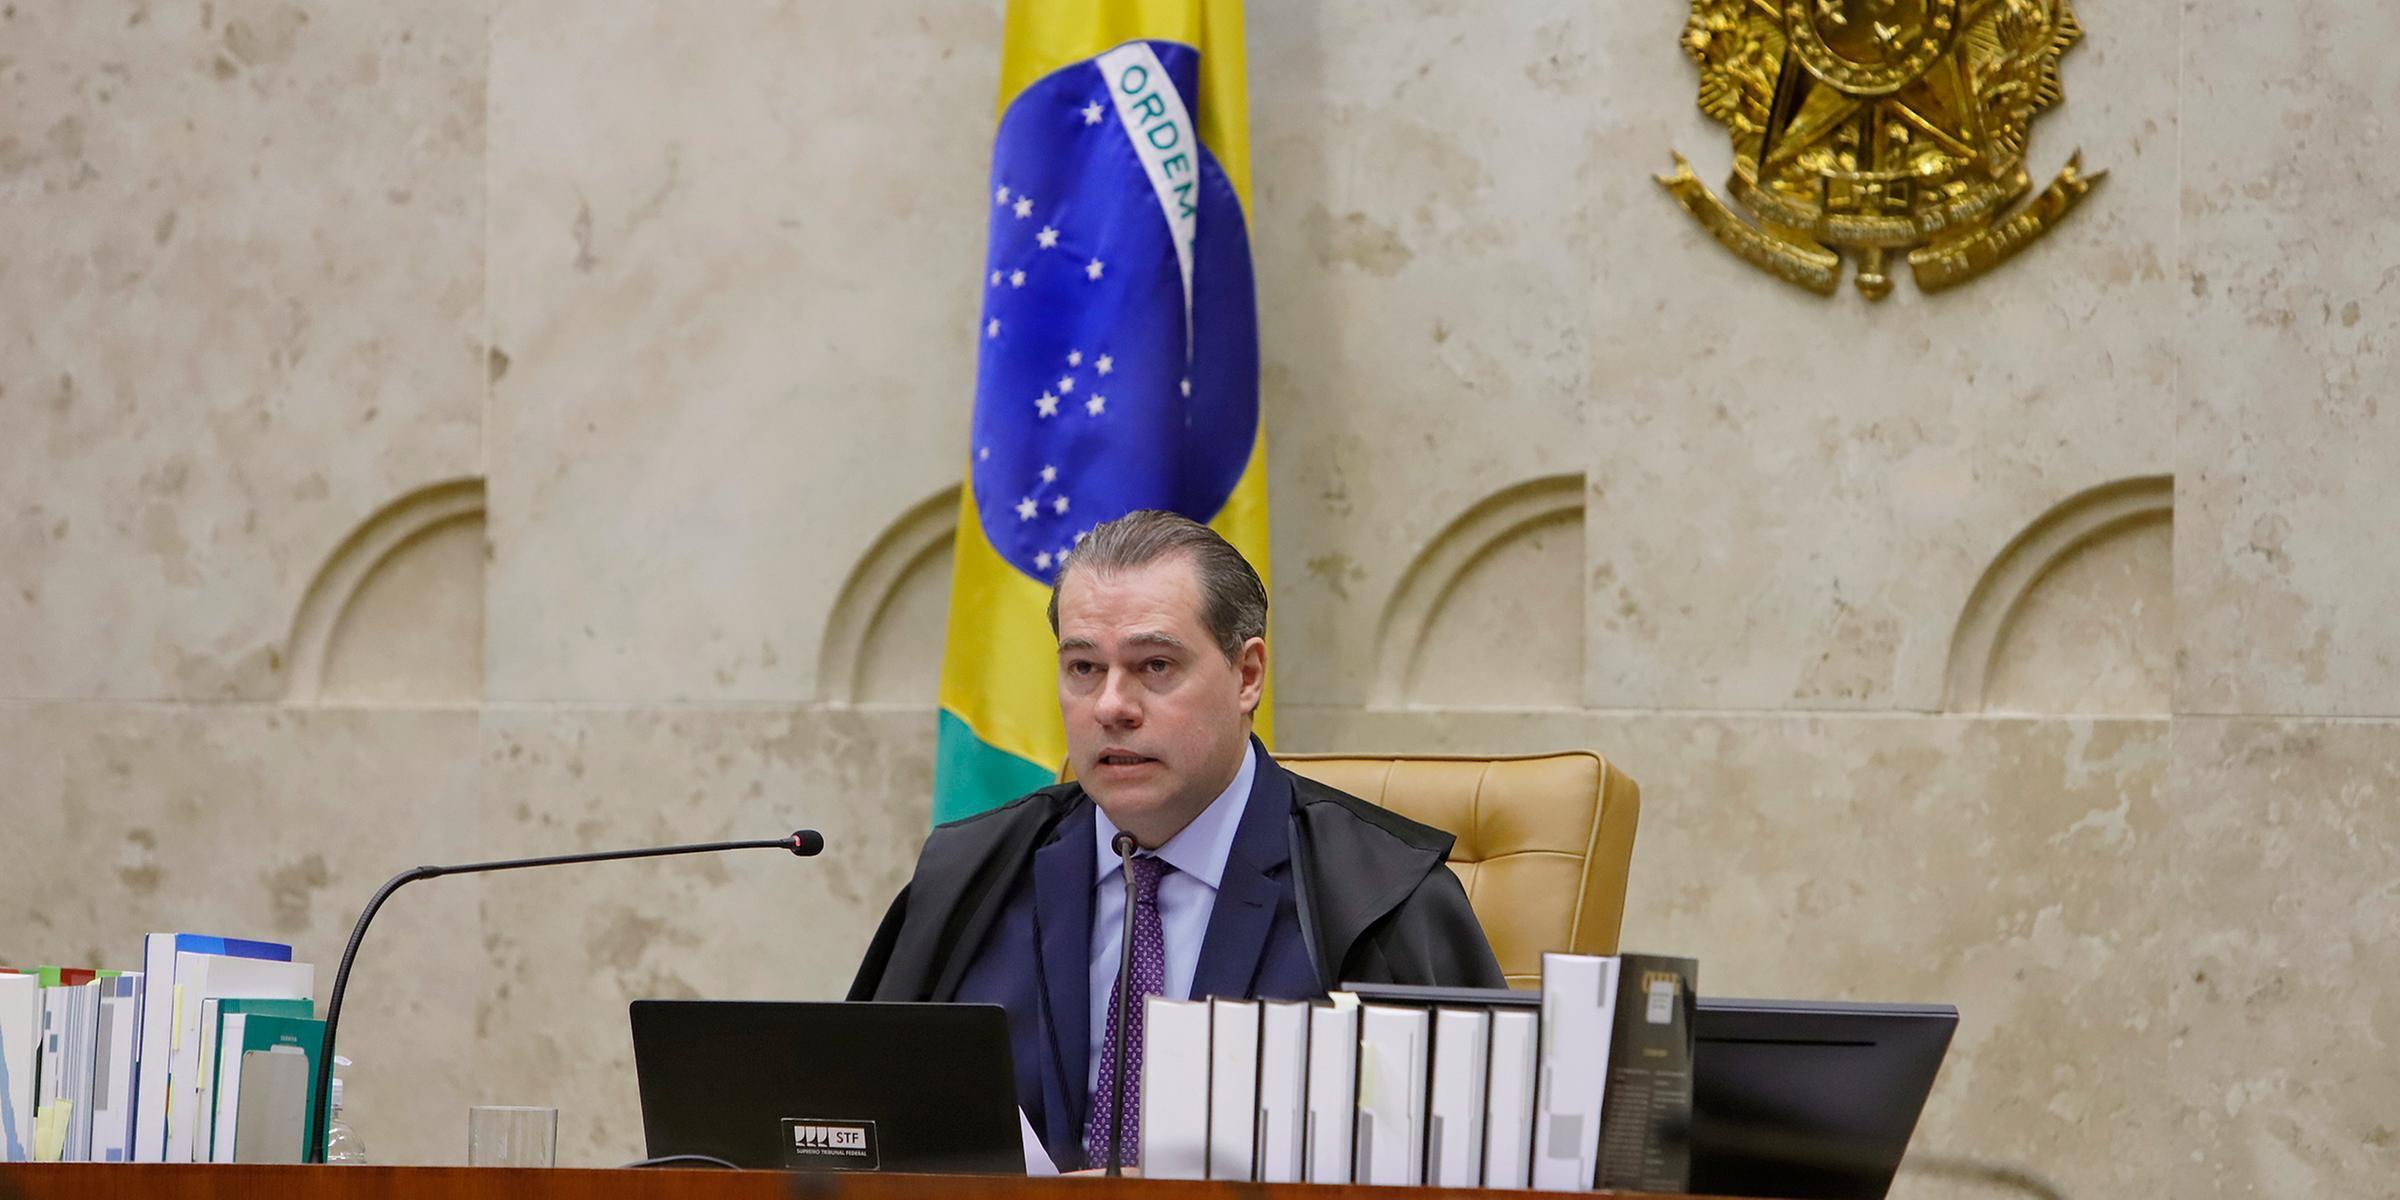 Pedido foi enviado ao presidente da Corte, ministro Dias Toffoli